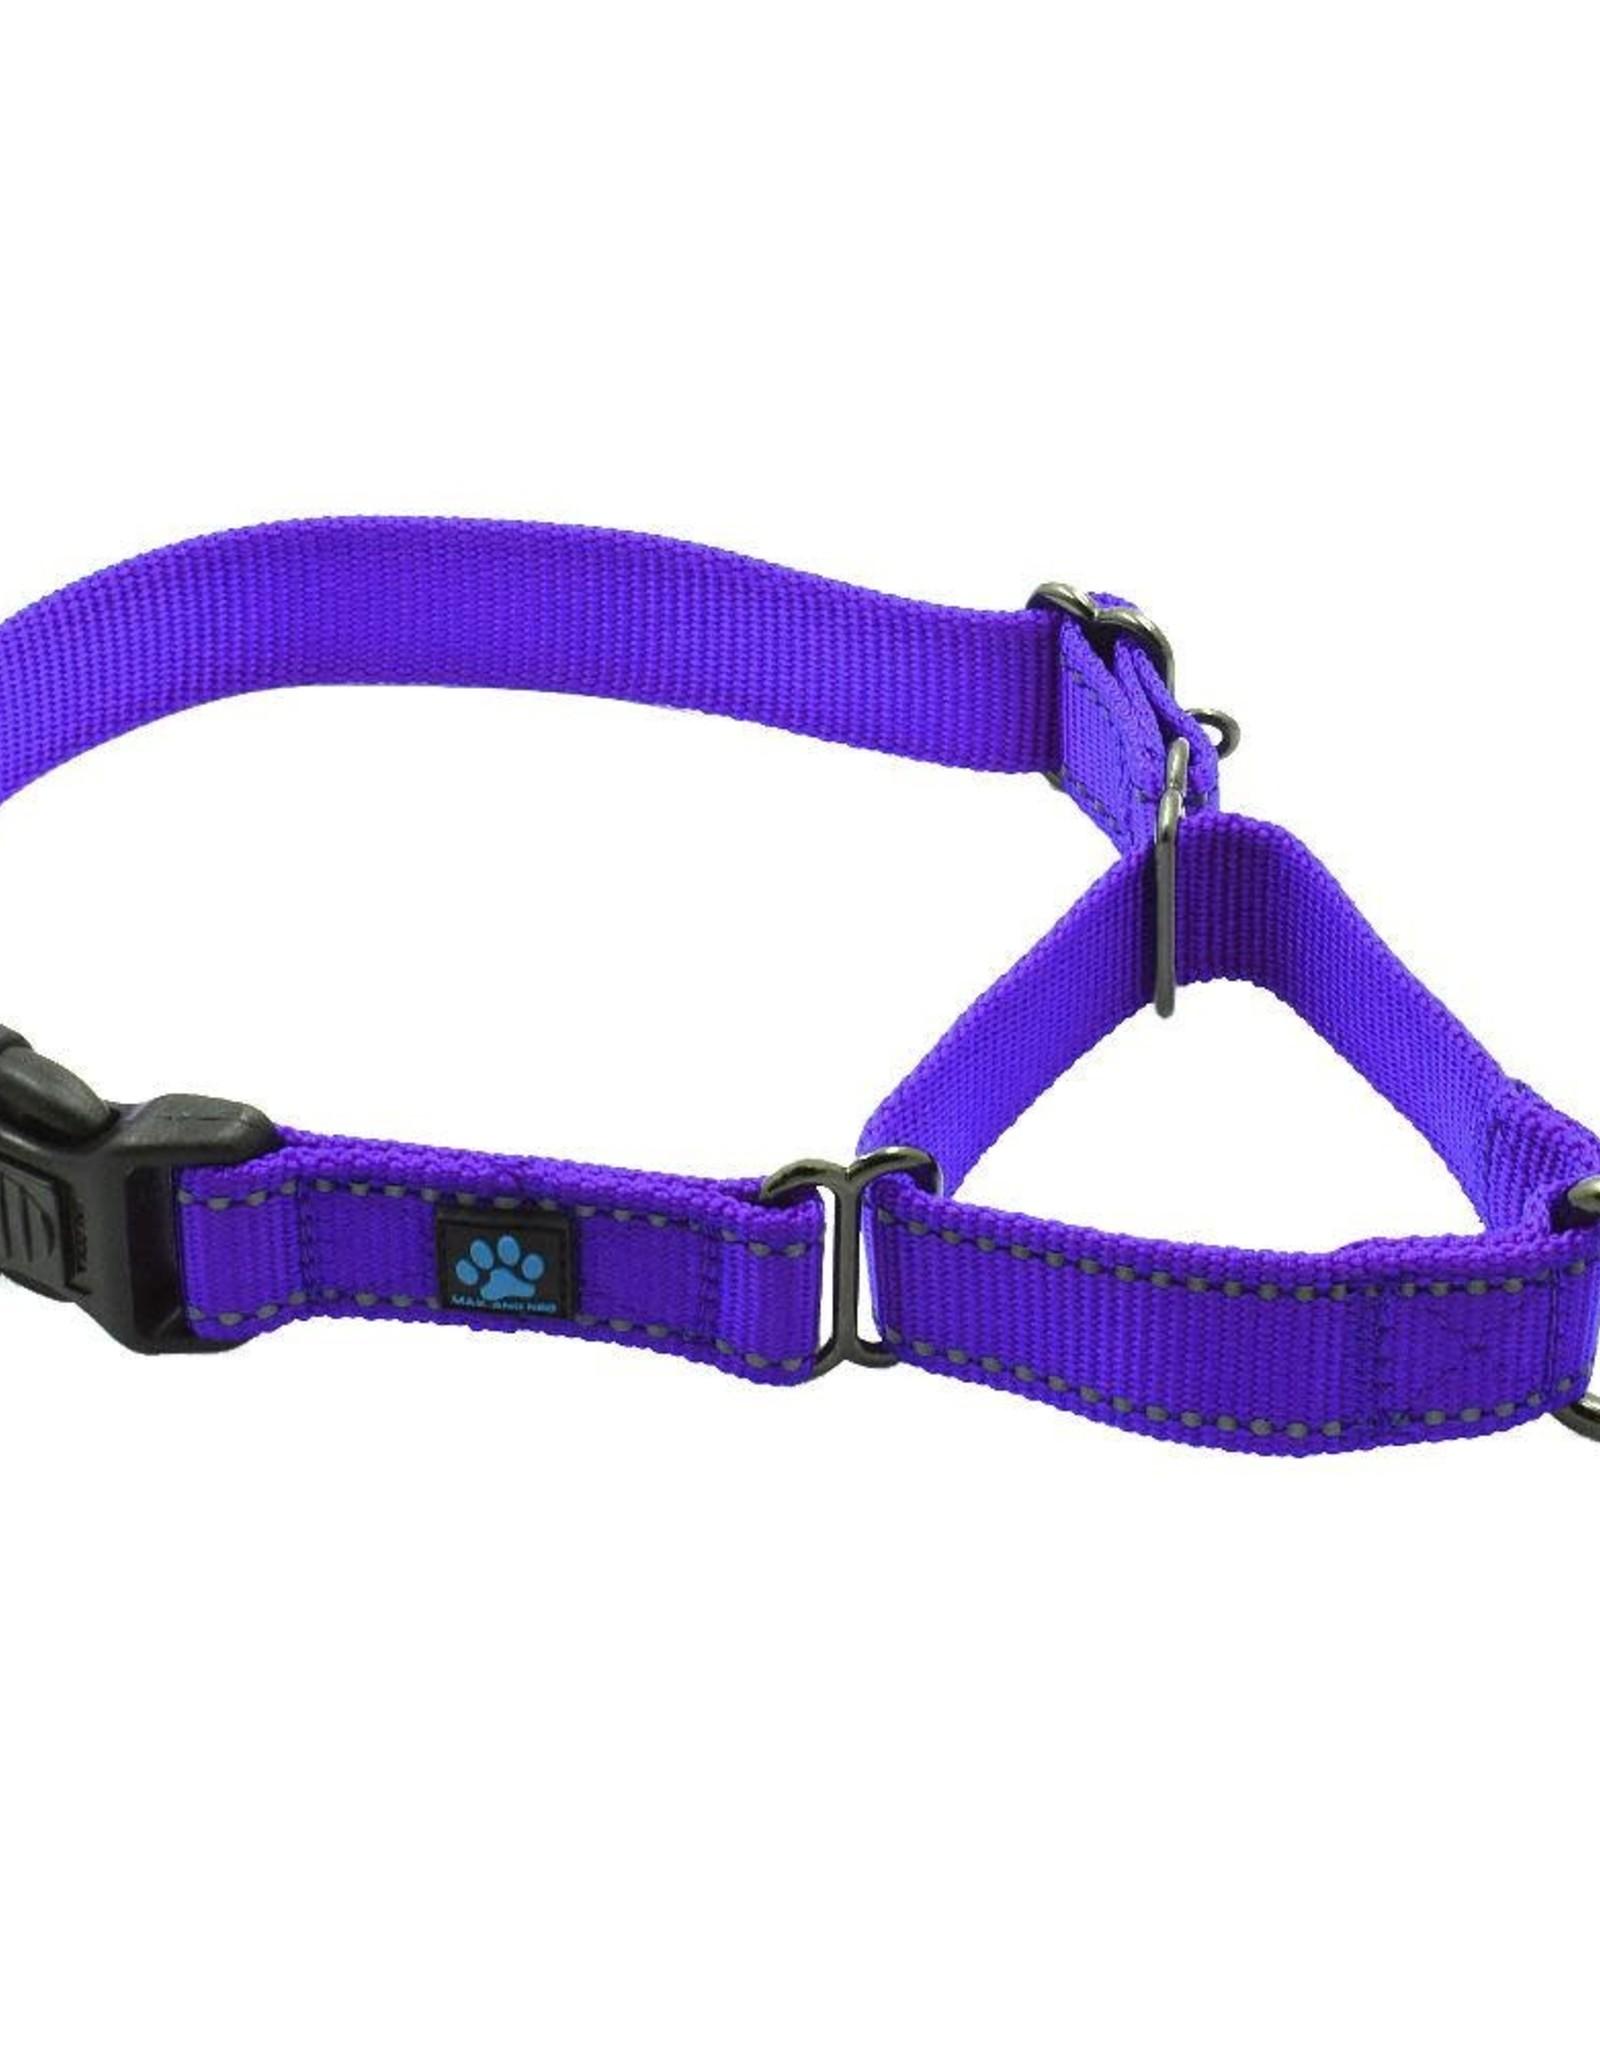 Max & Neo Nylon Martingale- Med Purple